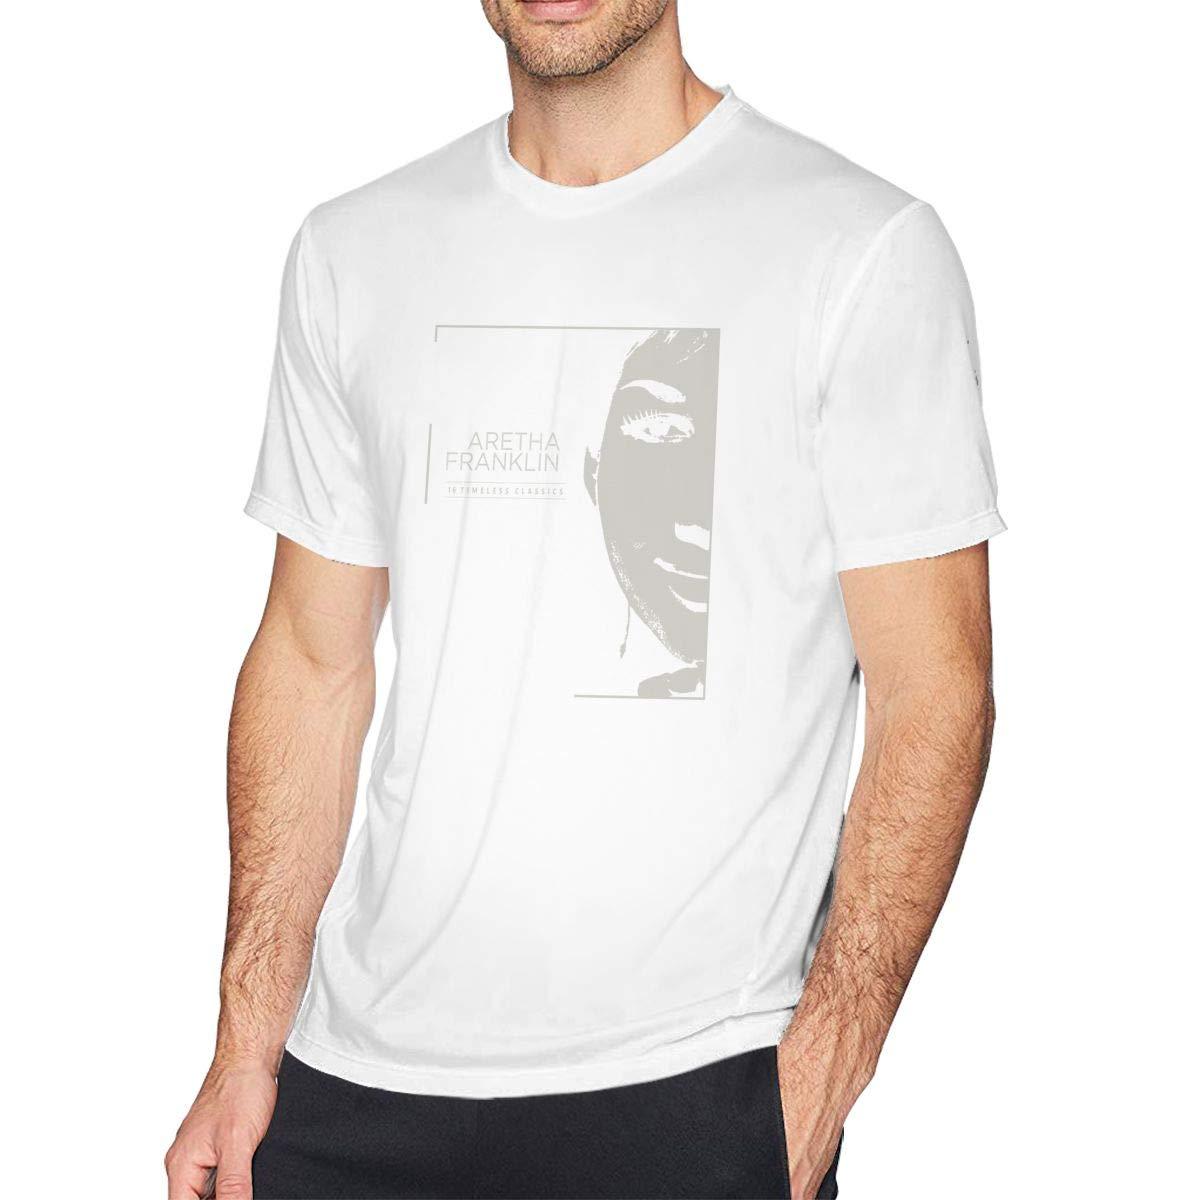 FengYuqi Aretha Franklin Man Classic Short Sleeve T-Shirt Athletic Cool Running T-Shirt Black